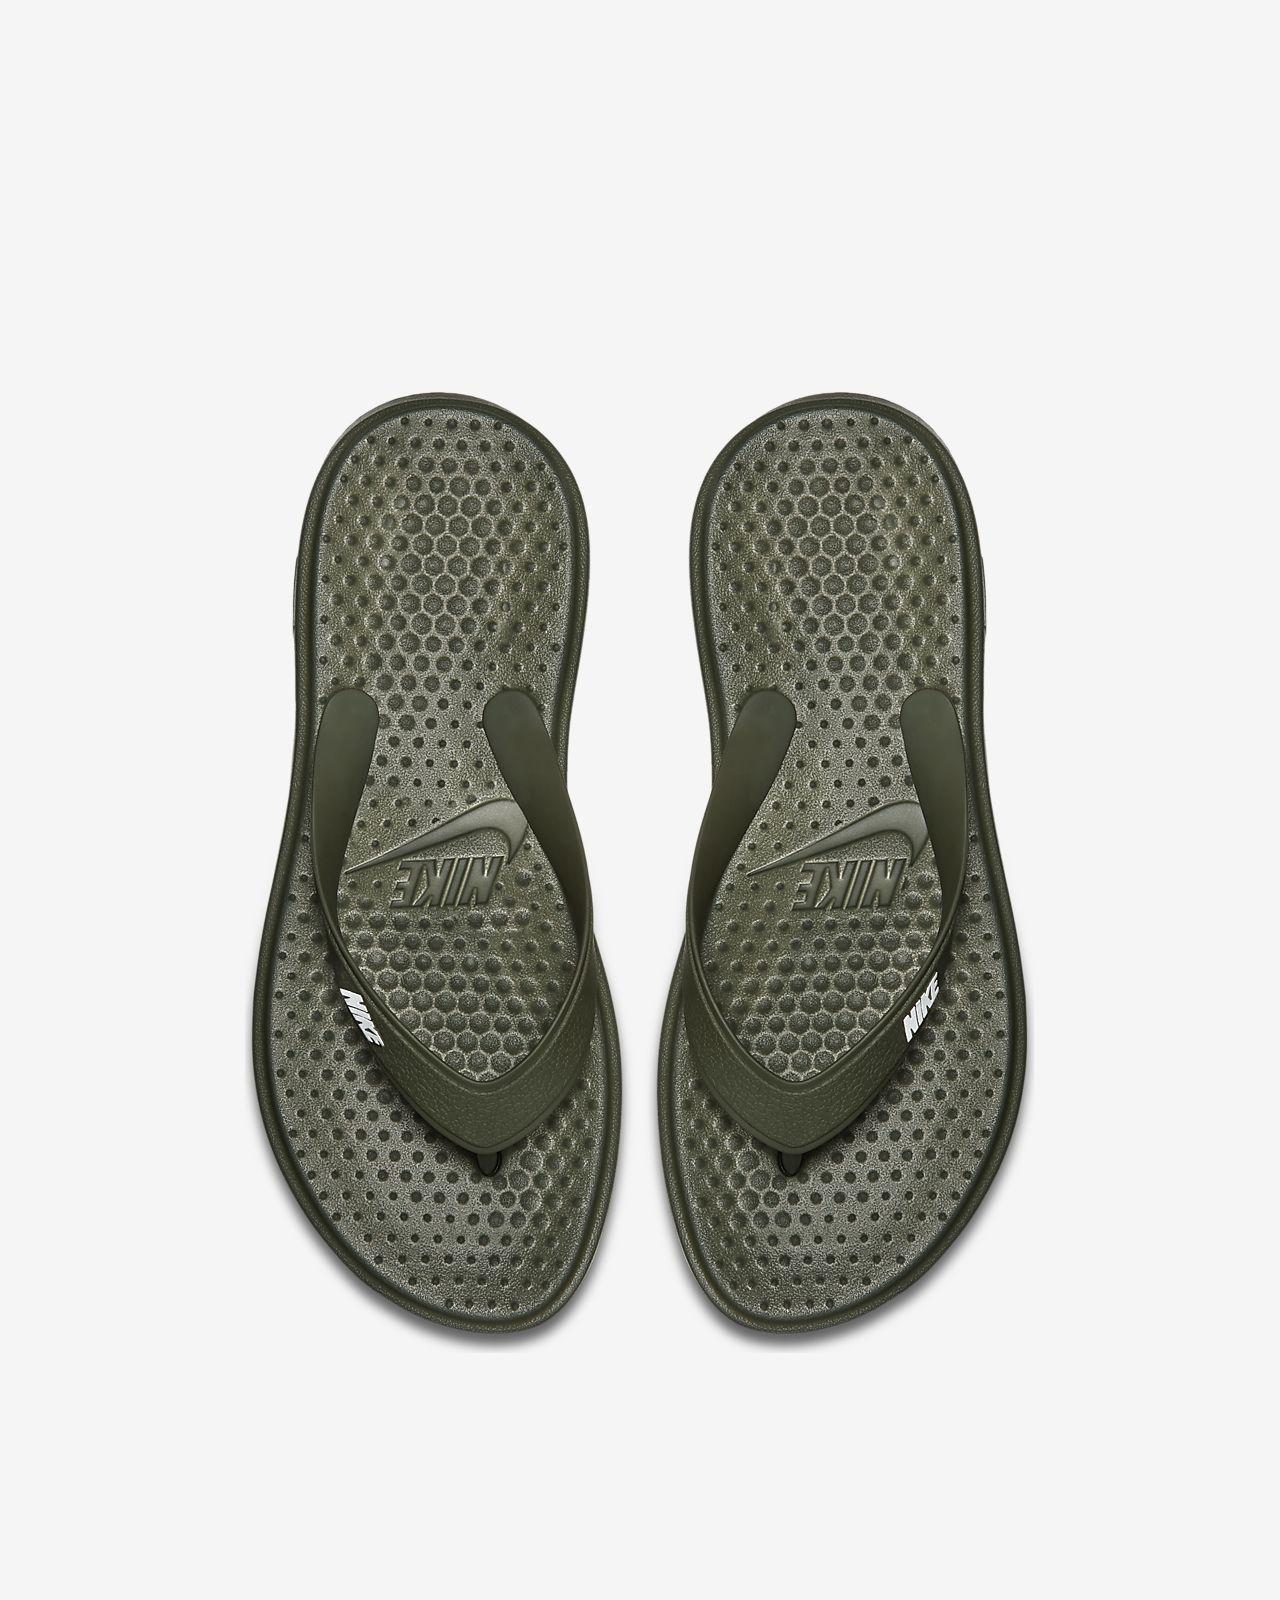 07532c11e Nike Solay Men's Flip-Flop. Nike.com DK